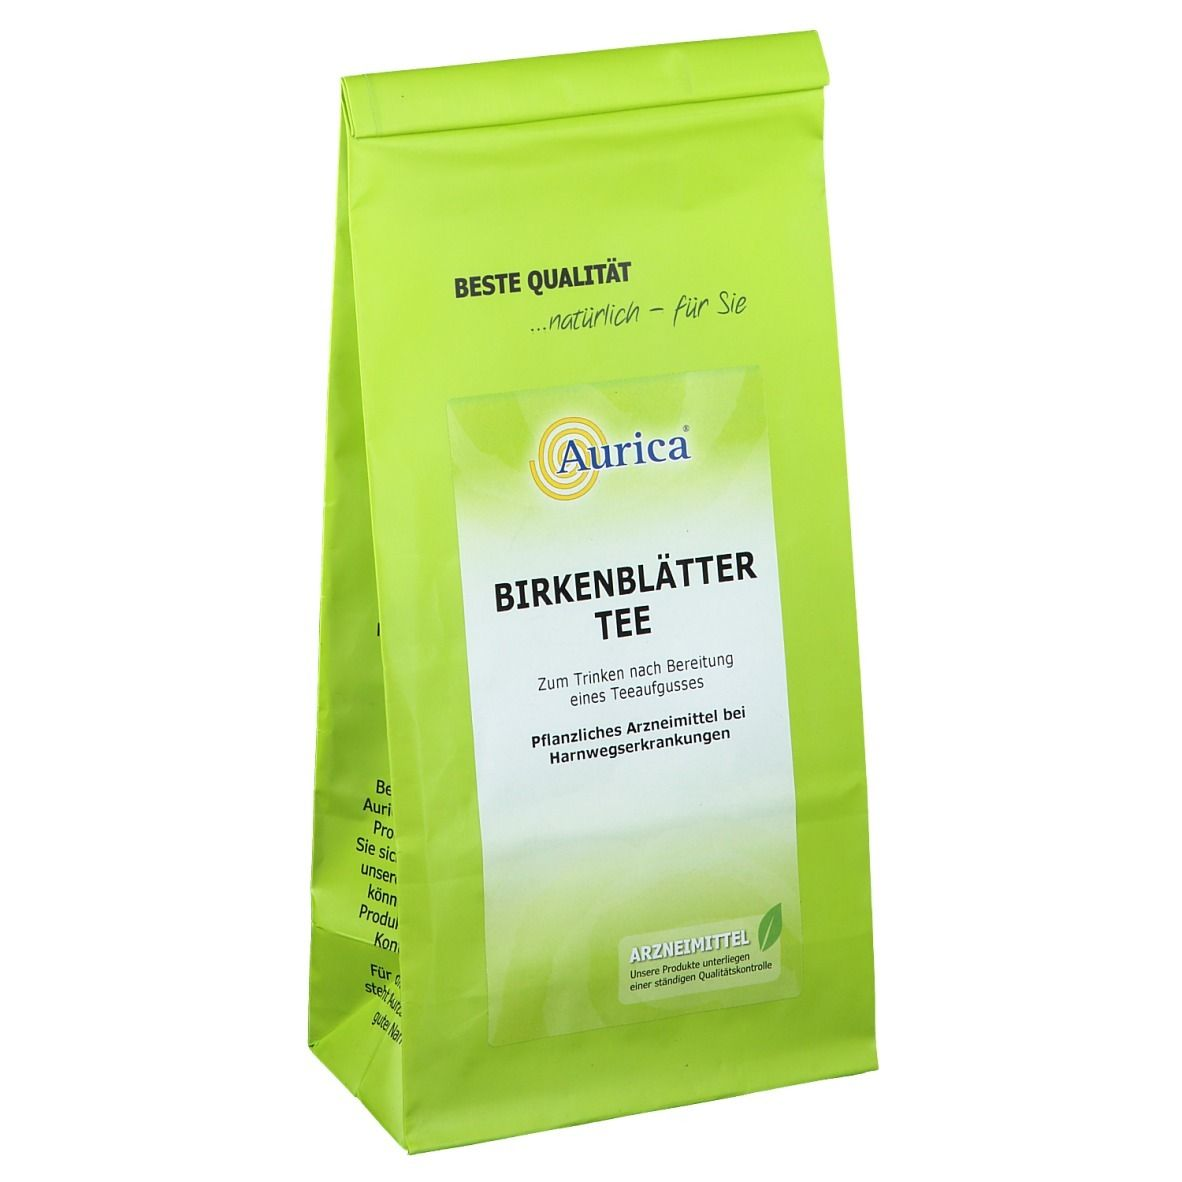 Aurica® Birkenblätter Tee